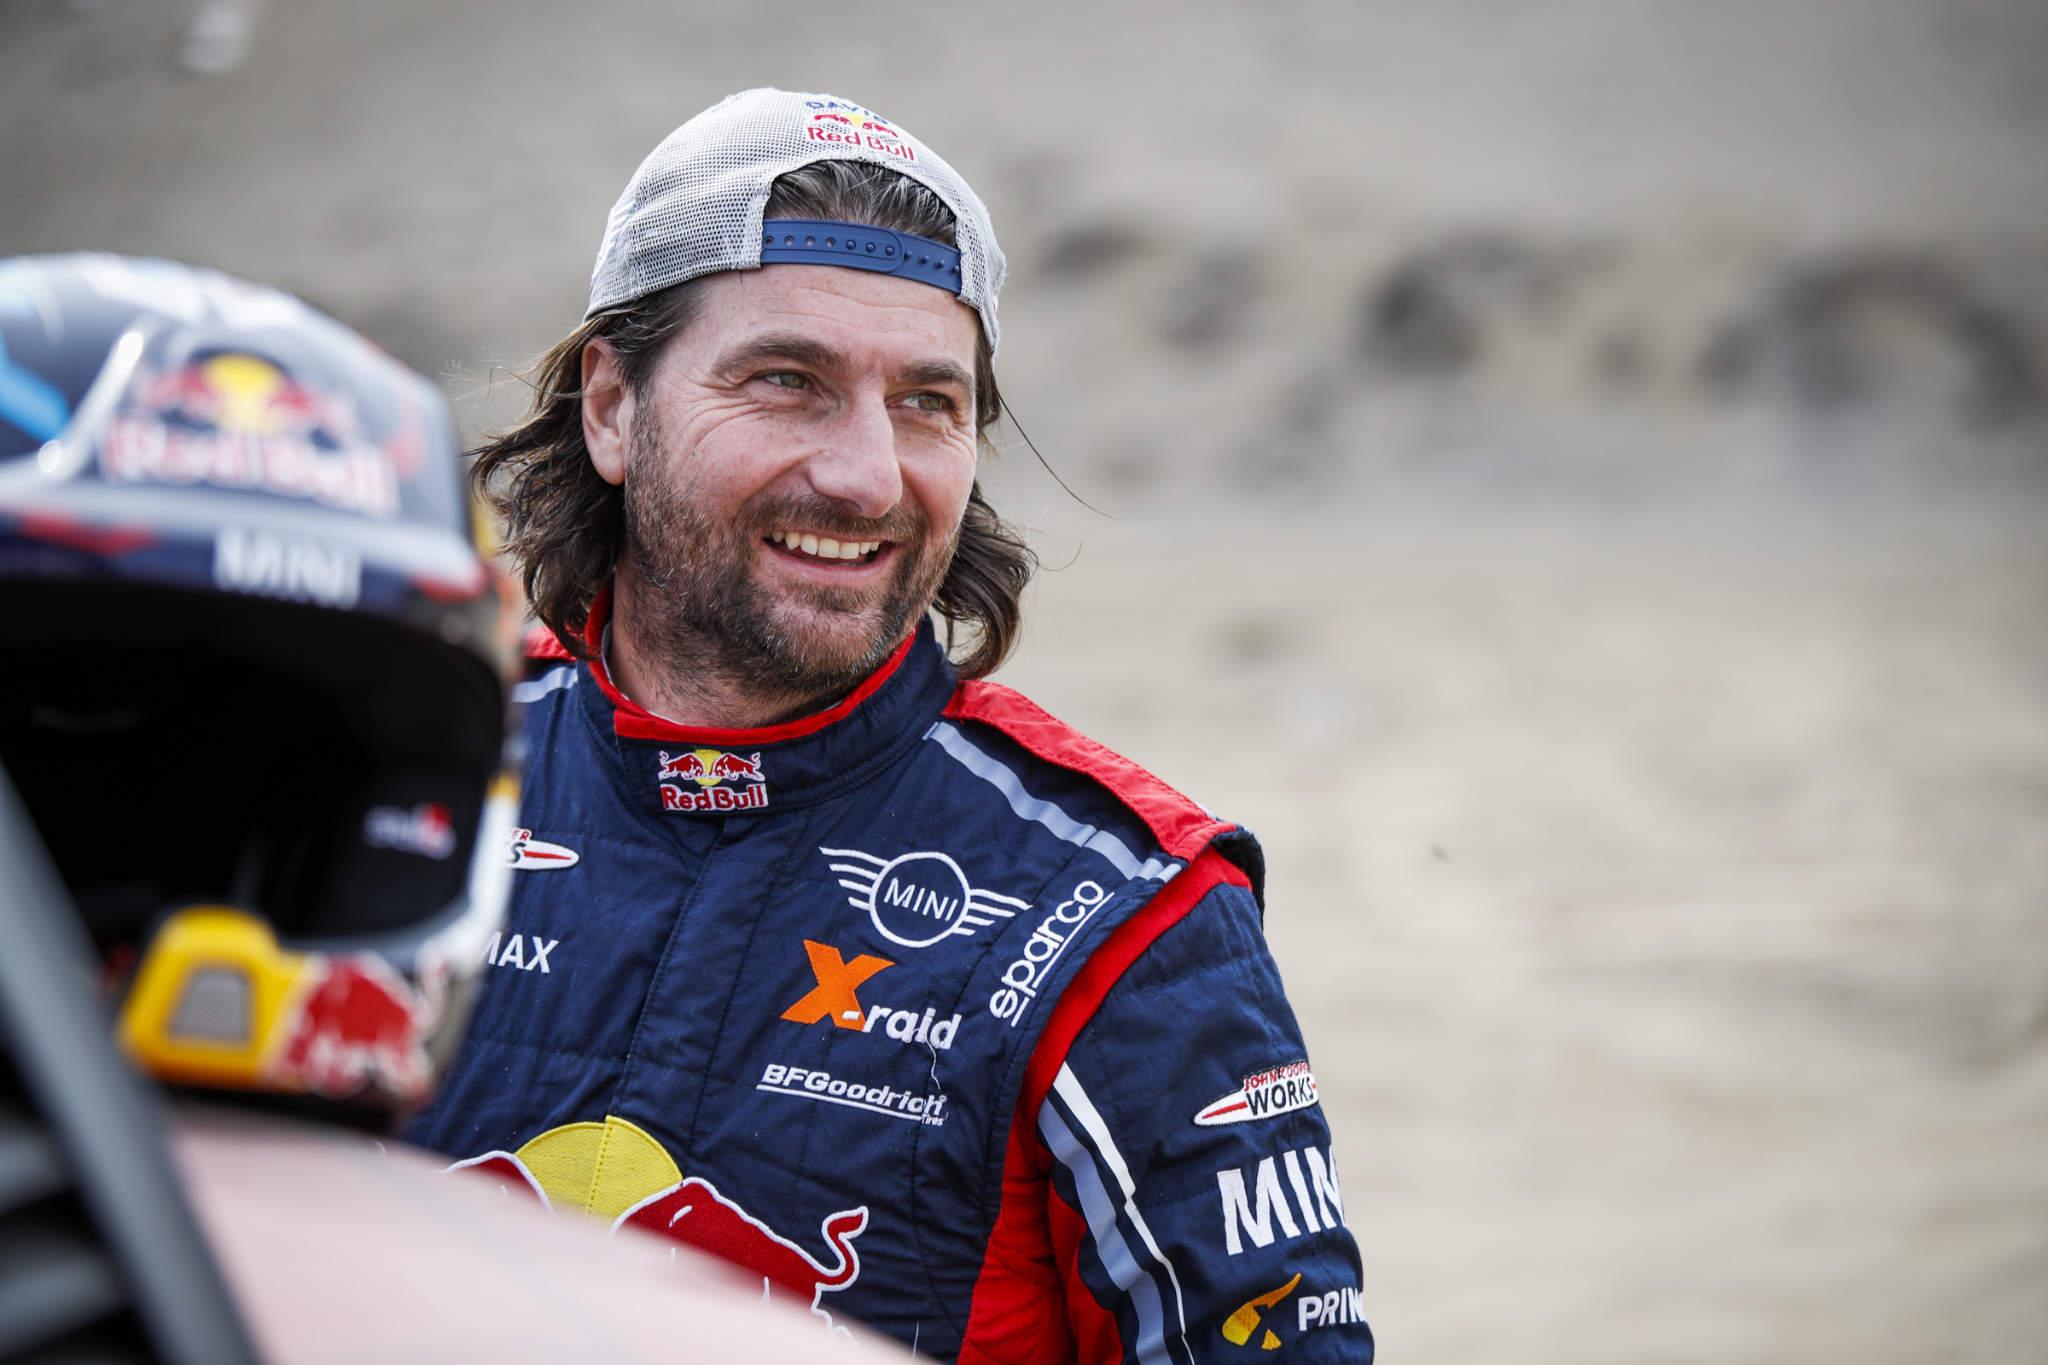 David Castera, Rally Dakar 2019